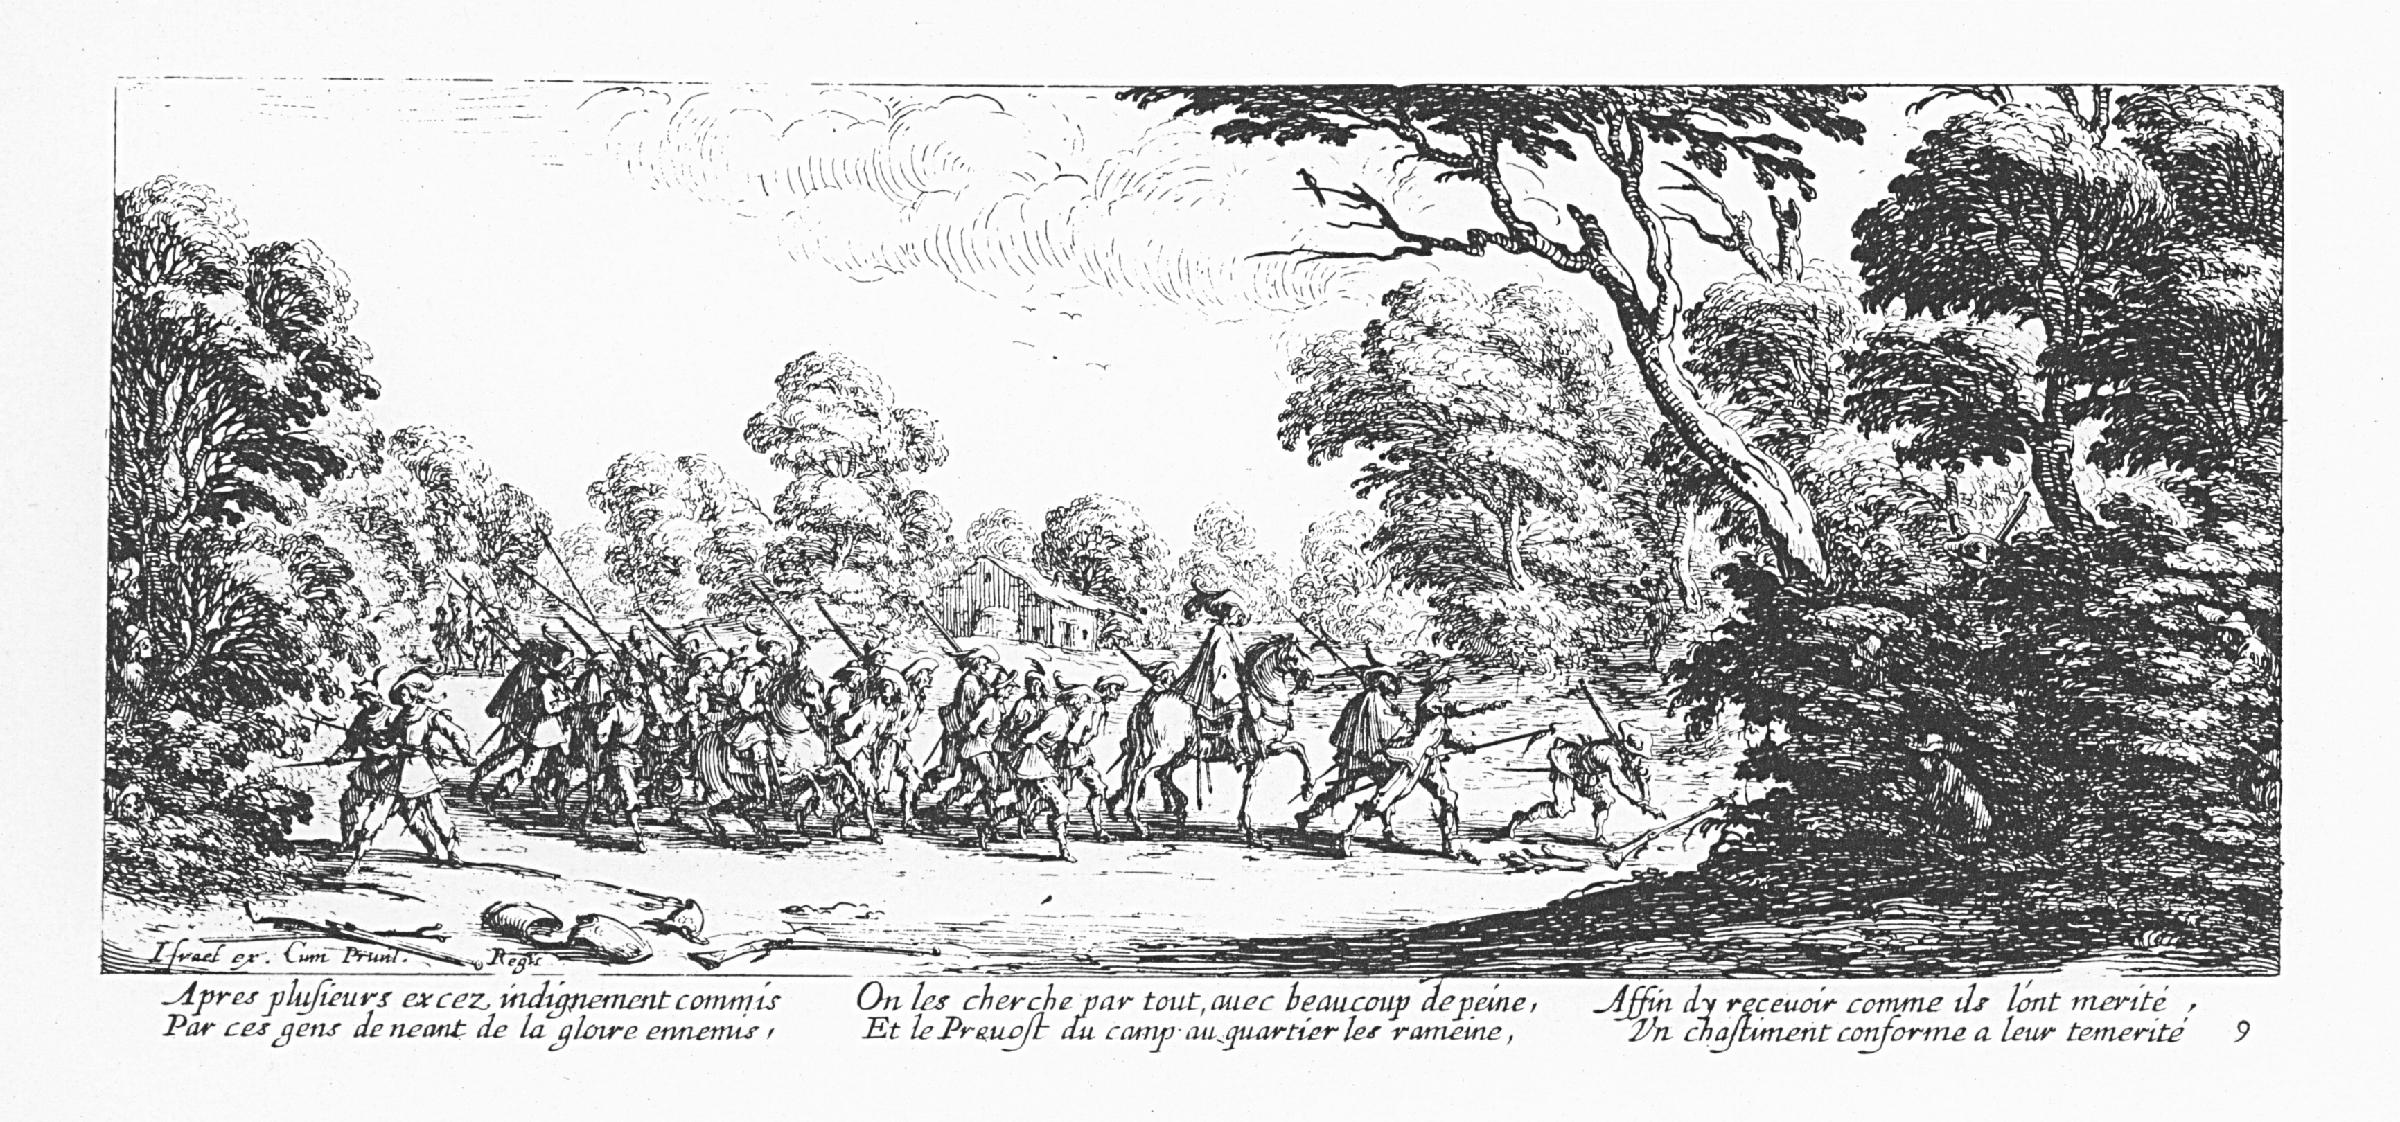 Découverte des malfaiteurs.Sumber gambar: wikimedia.org